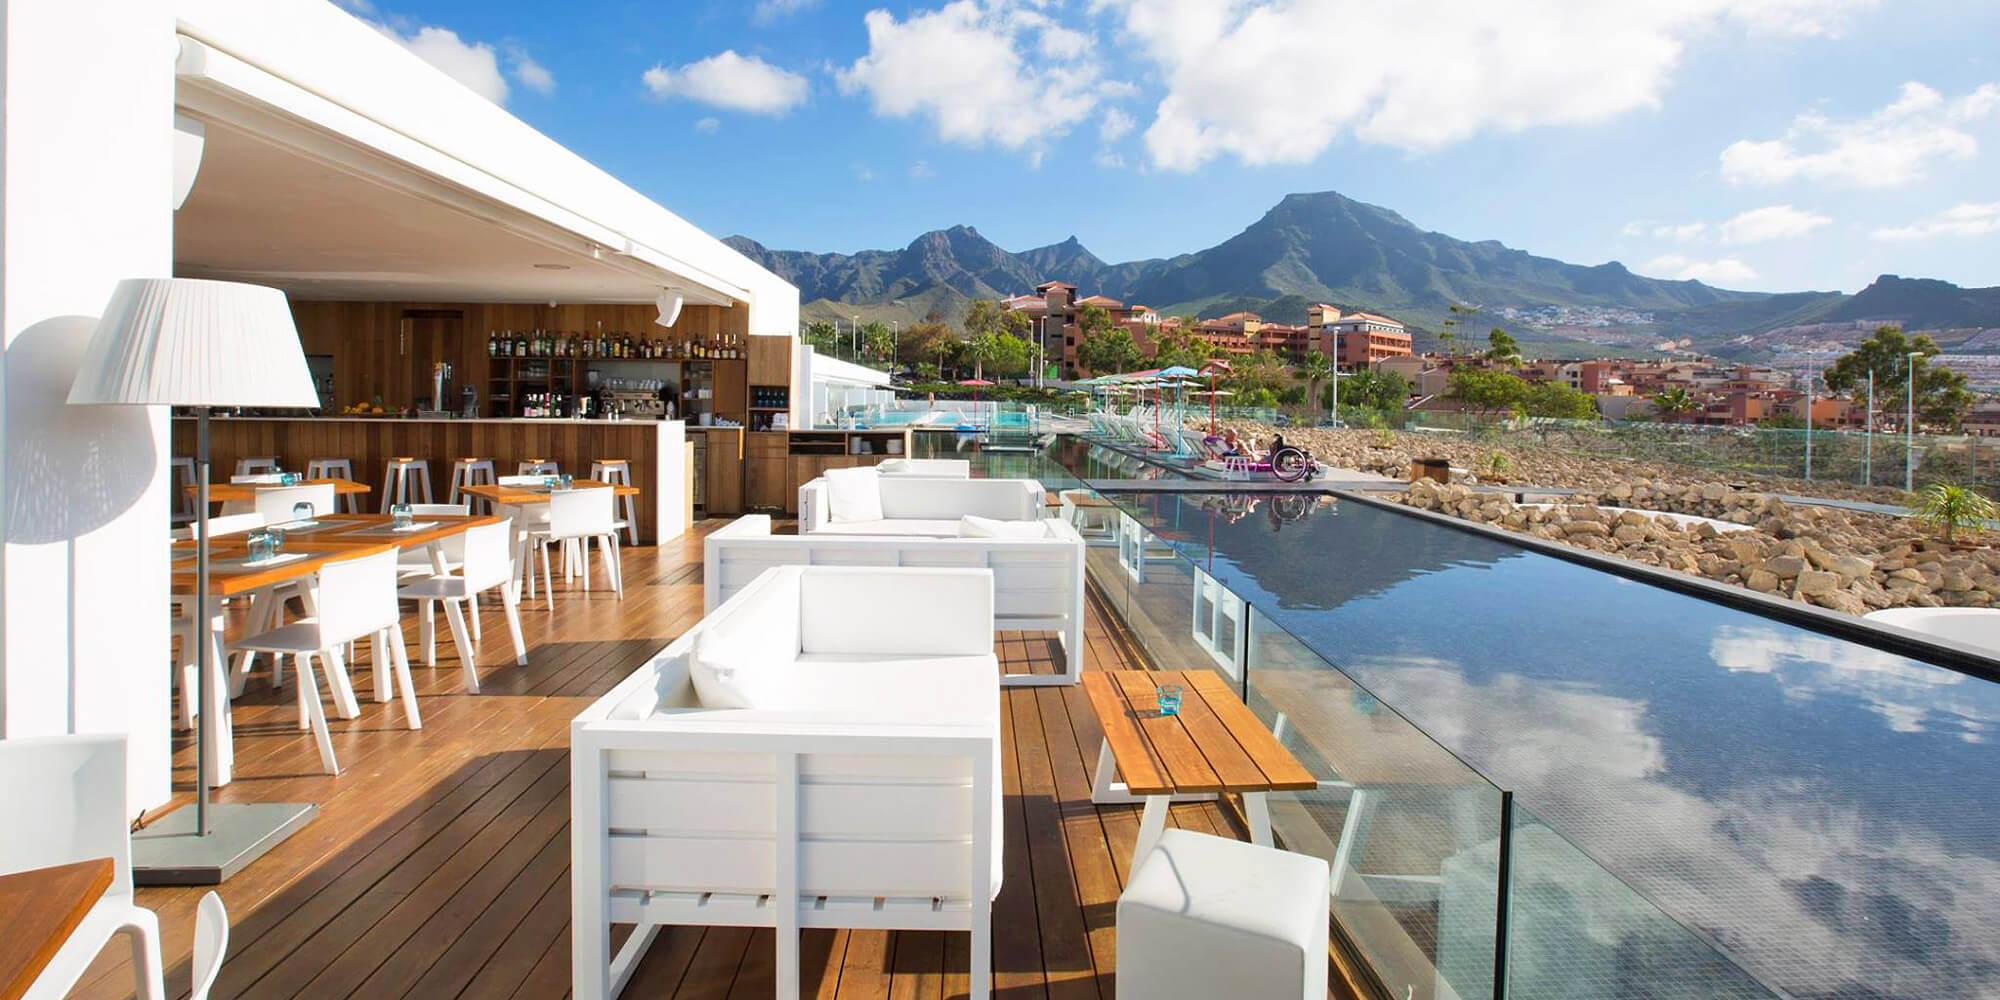 Baobab Suites Costa Adeje Tenerife Hotel Reviews